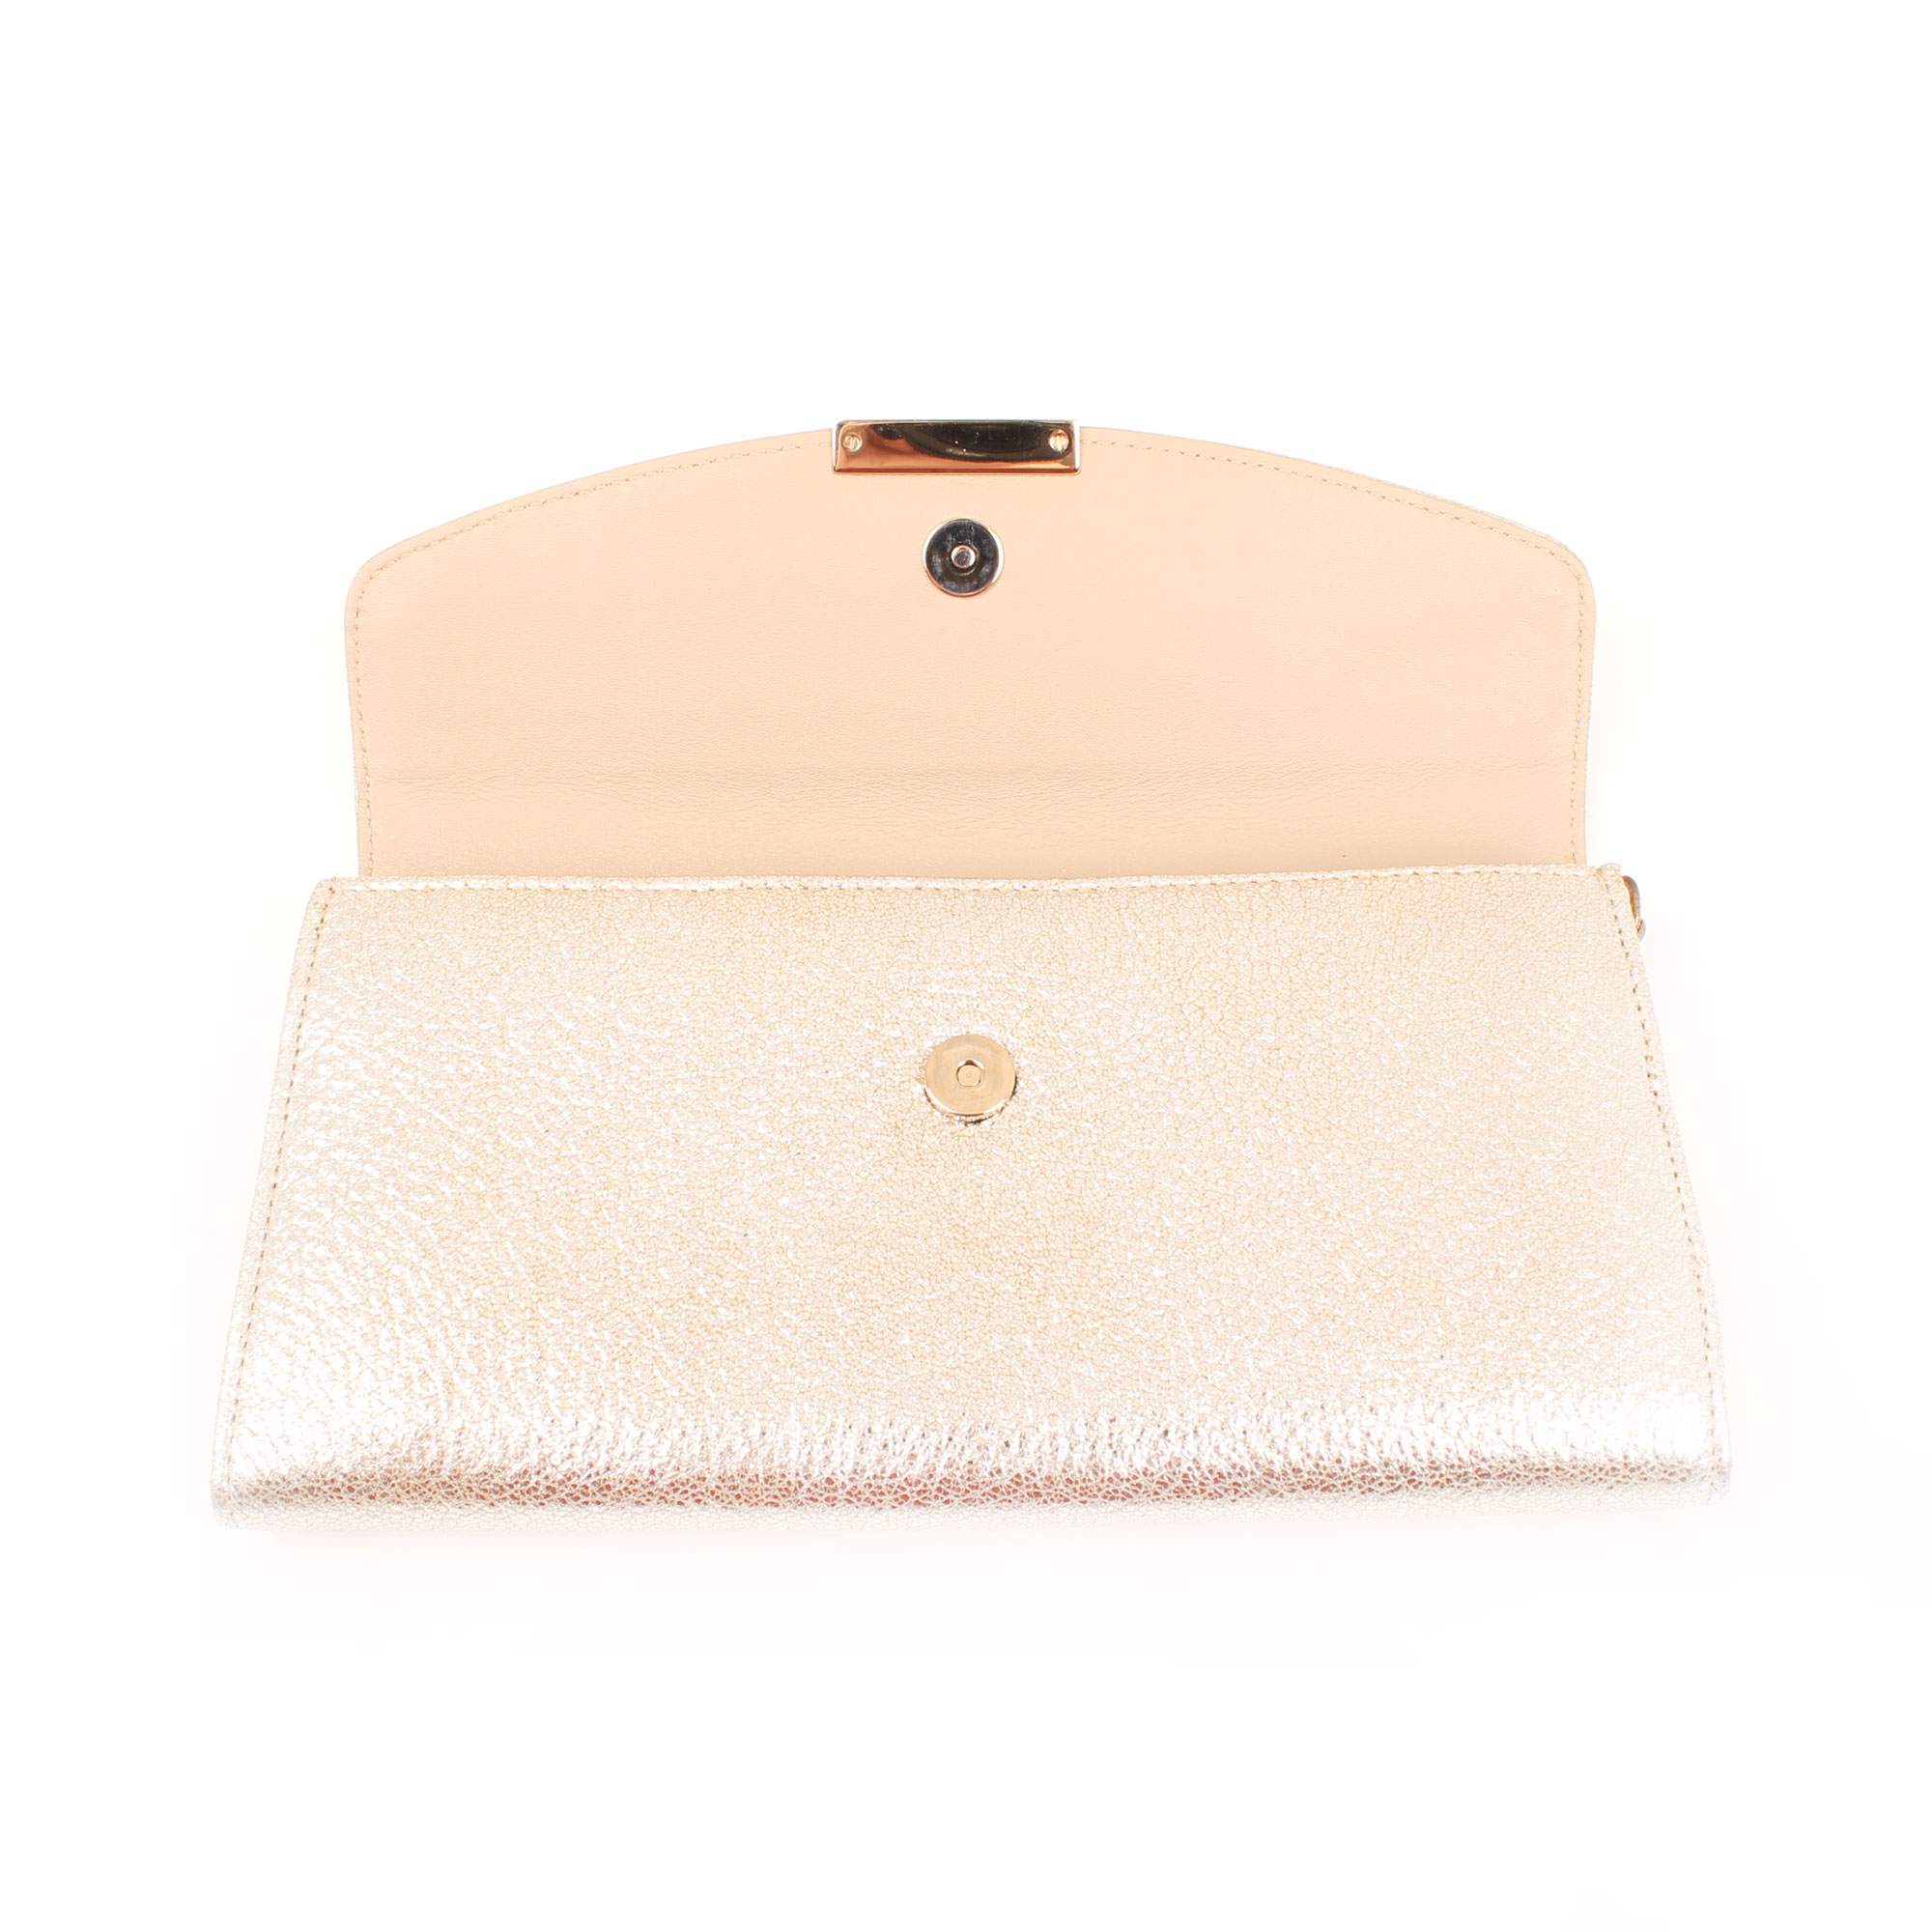 bag-clutch-jimmy-choo-riane-glitter-silver-open